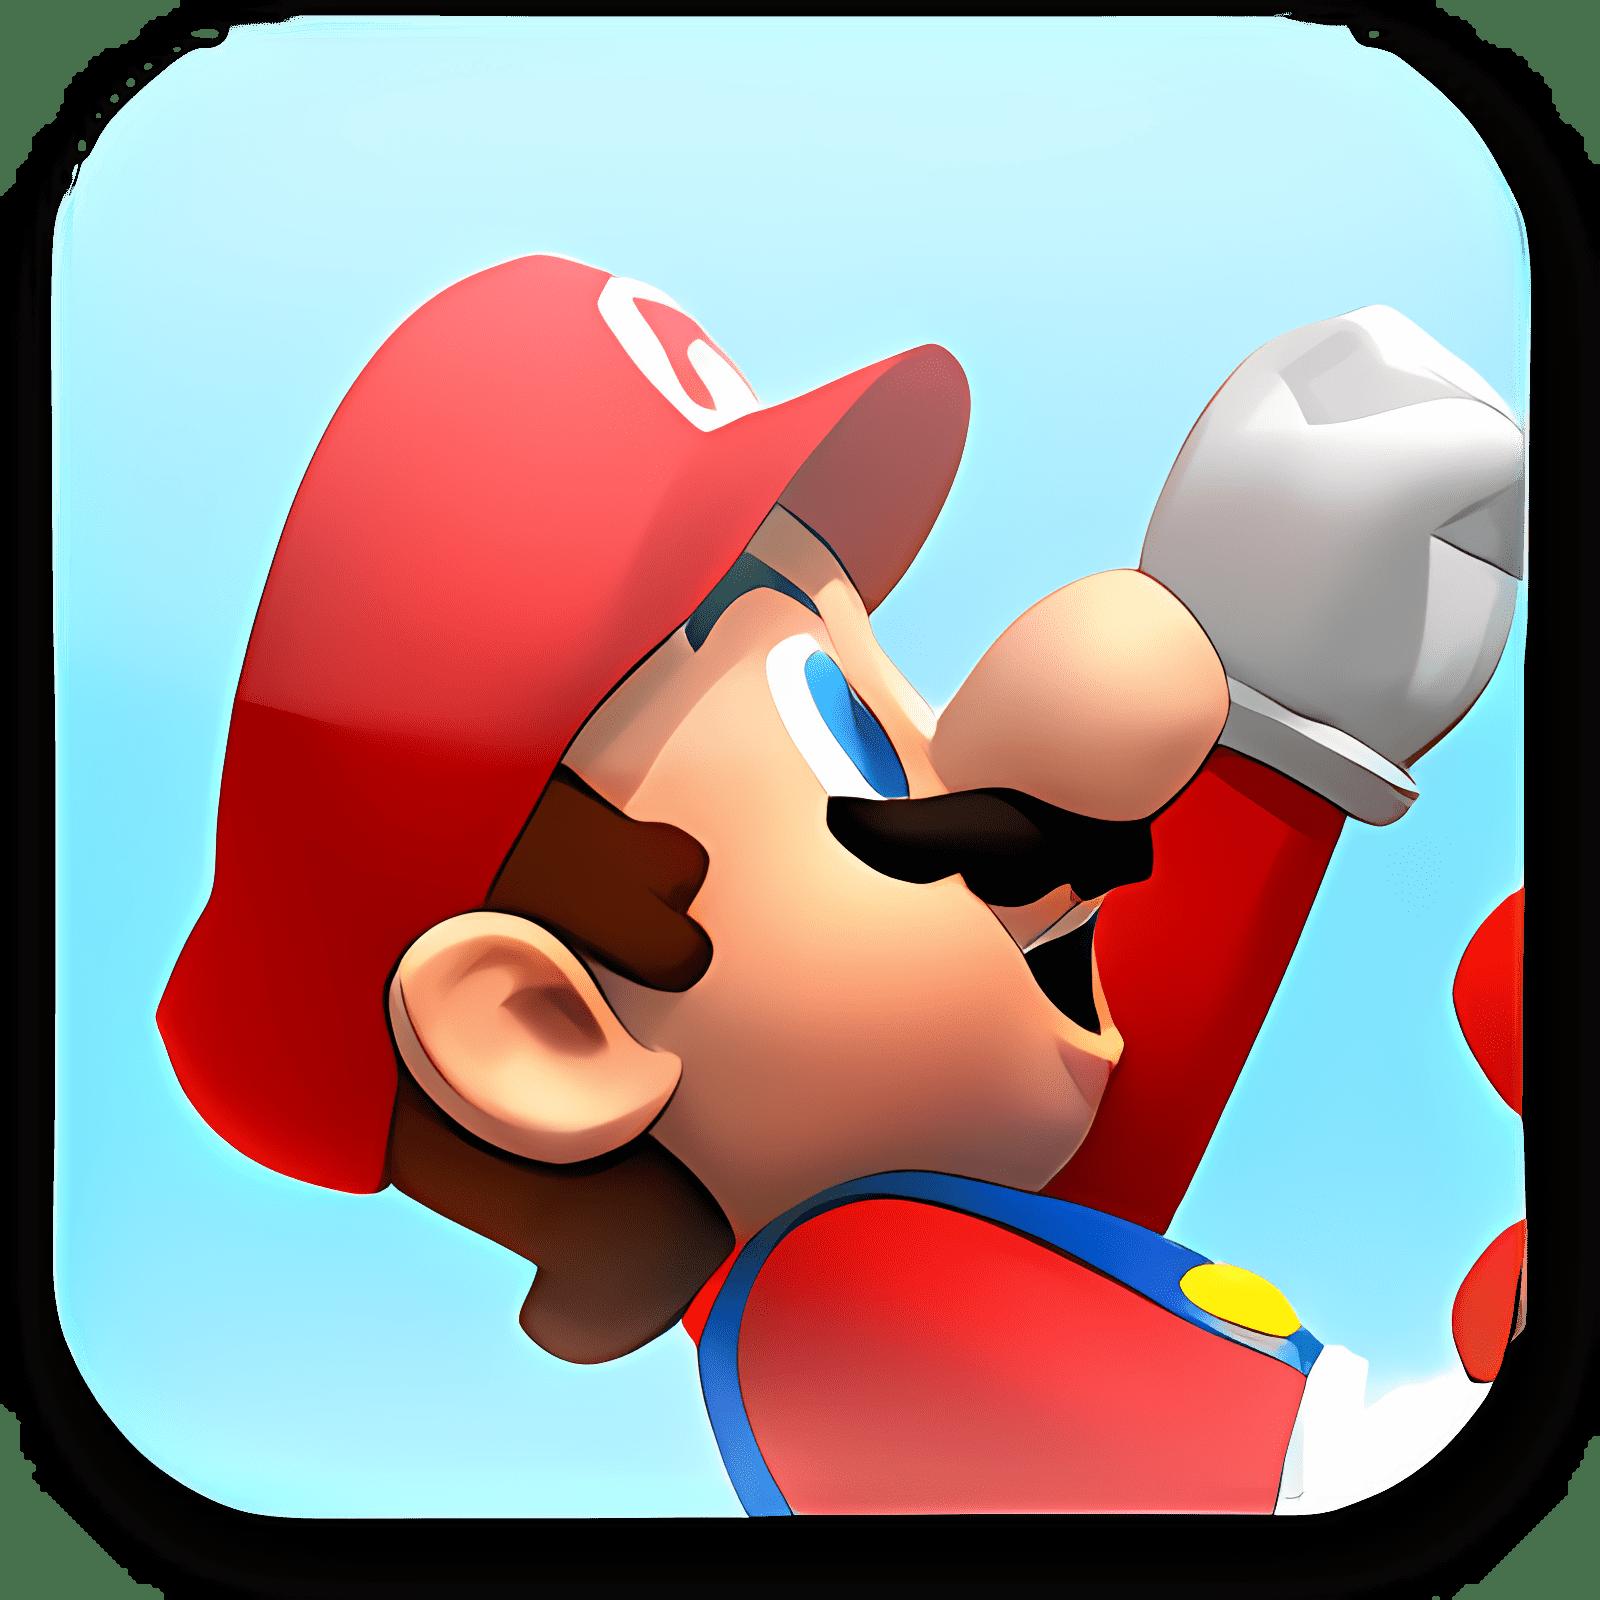 New Super Mario Bros. Wii Wallpaper